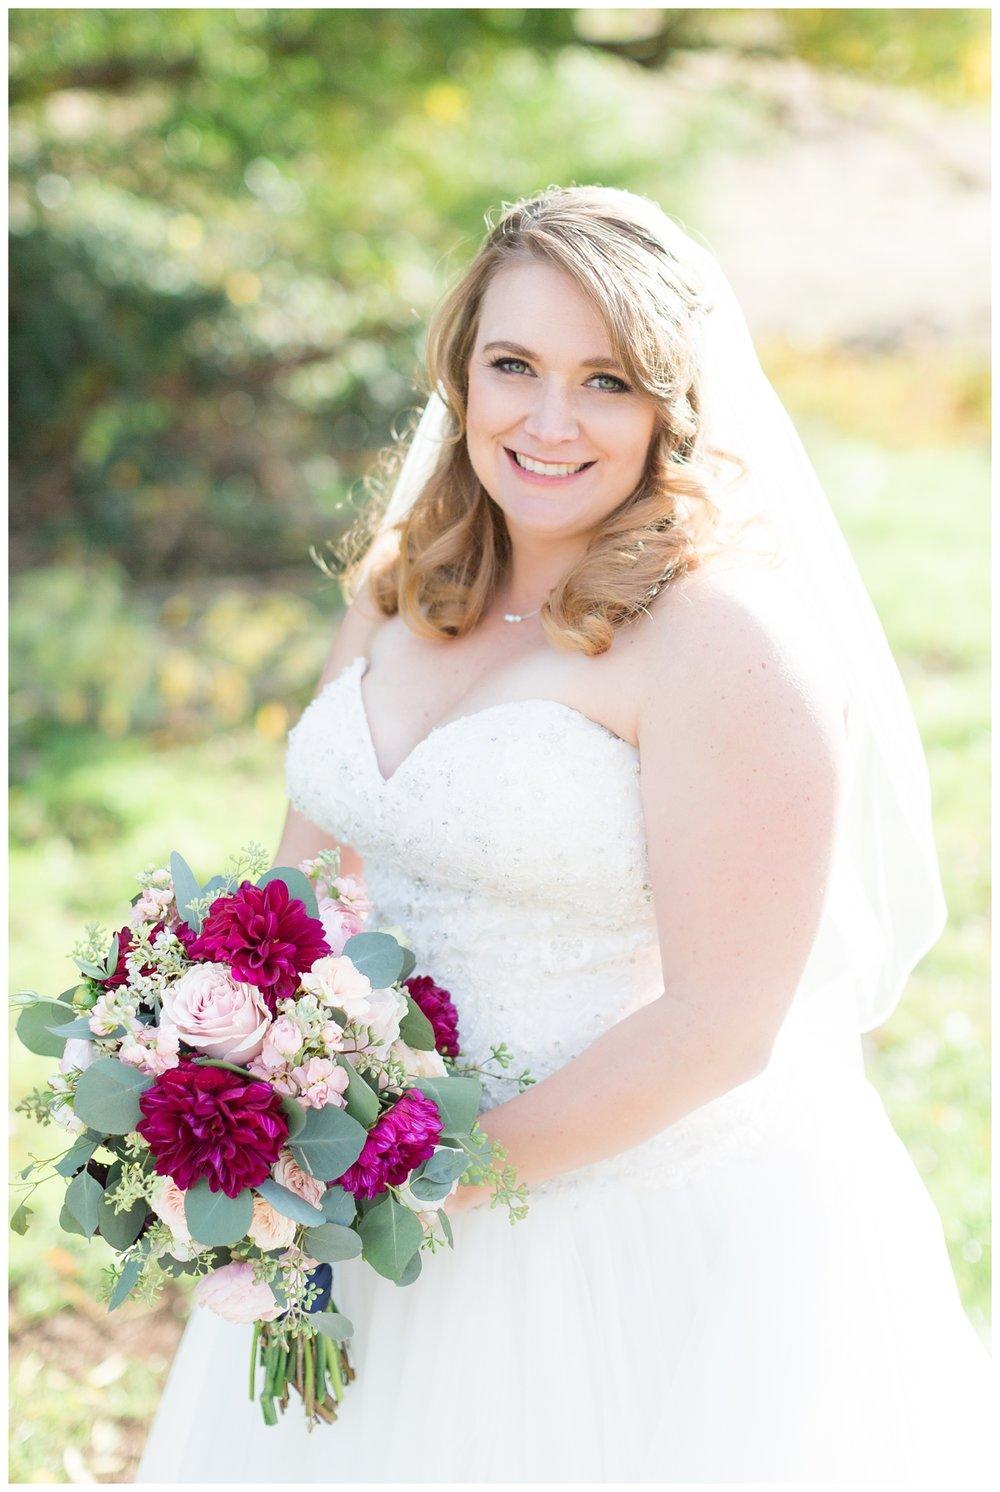 beautiful bride smiling looking at the camera